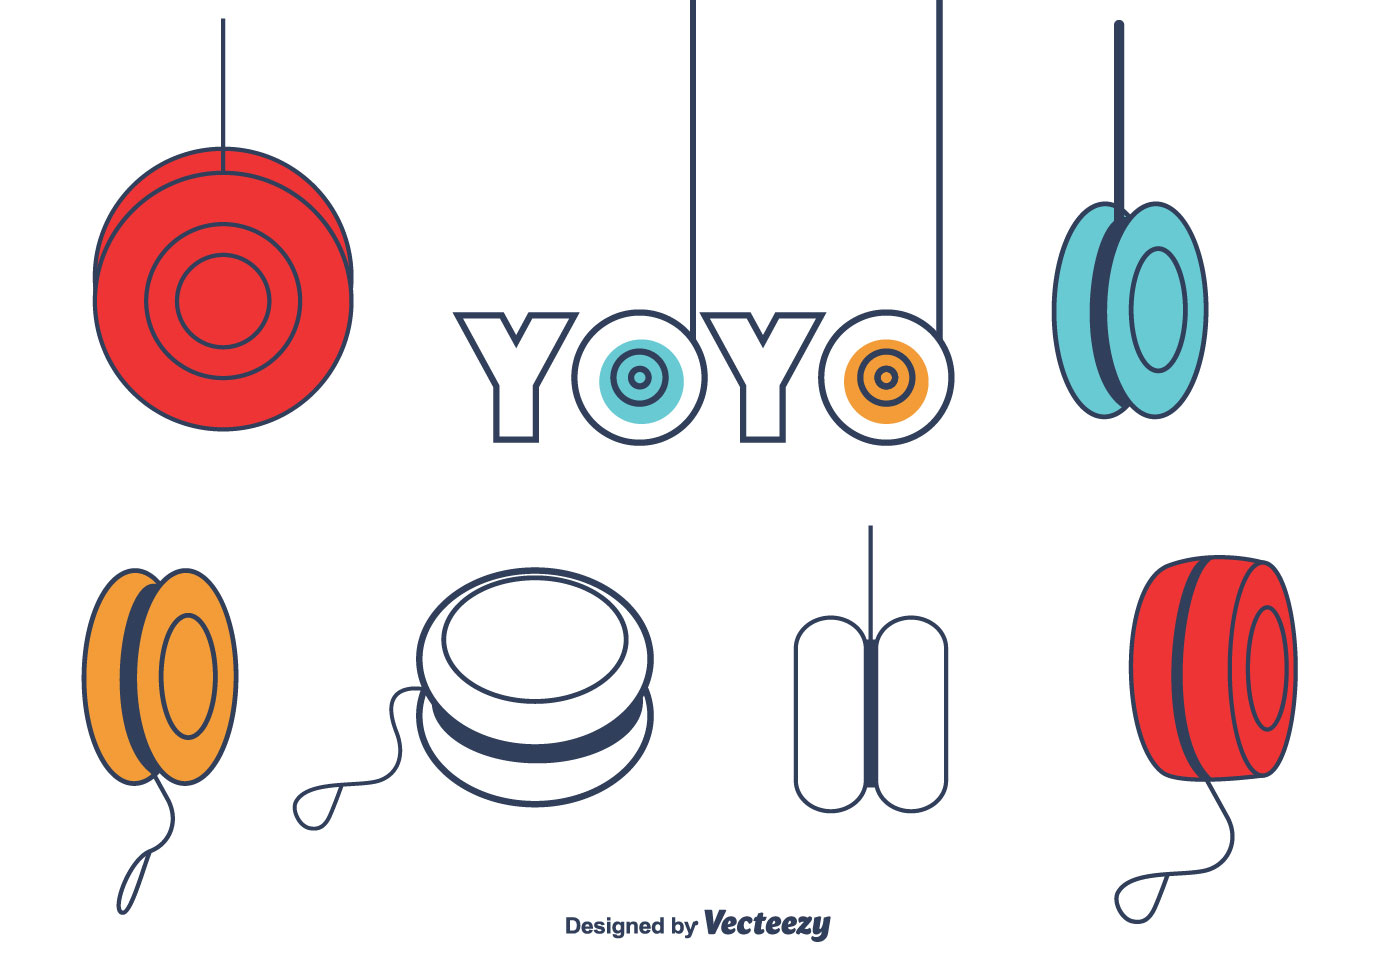 Yoyo Vector Download Free Vector Art Stock Graphics